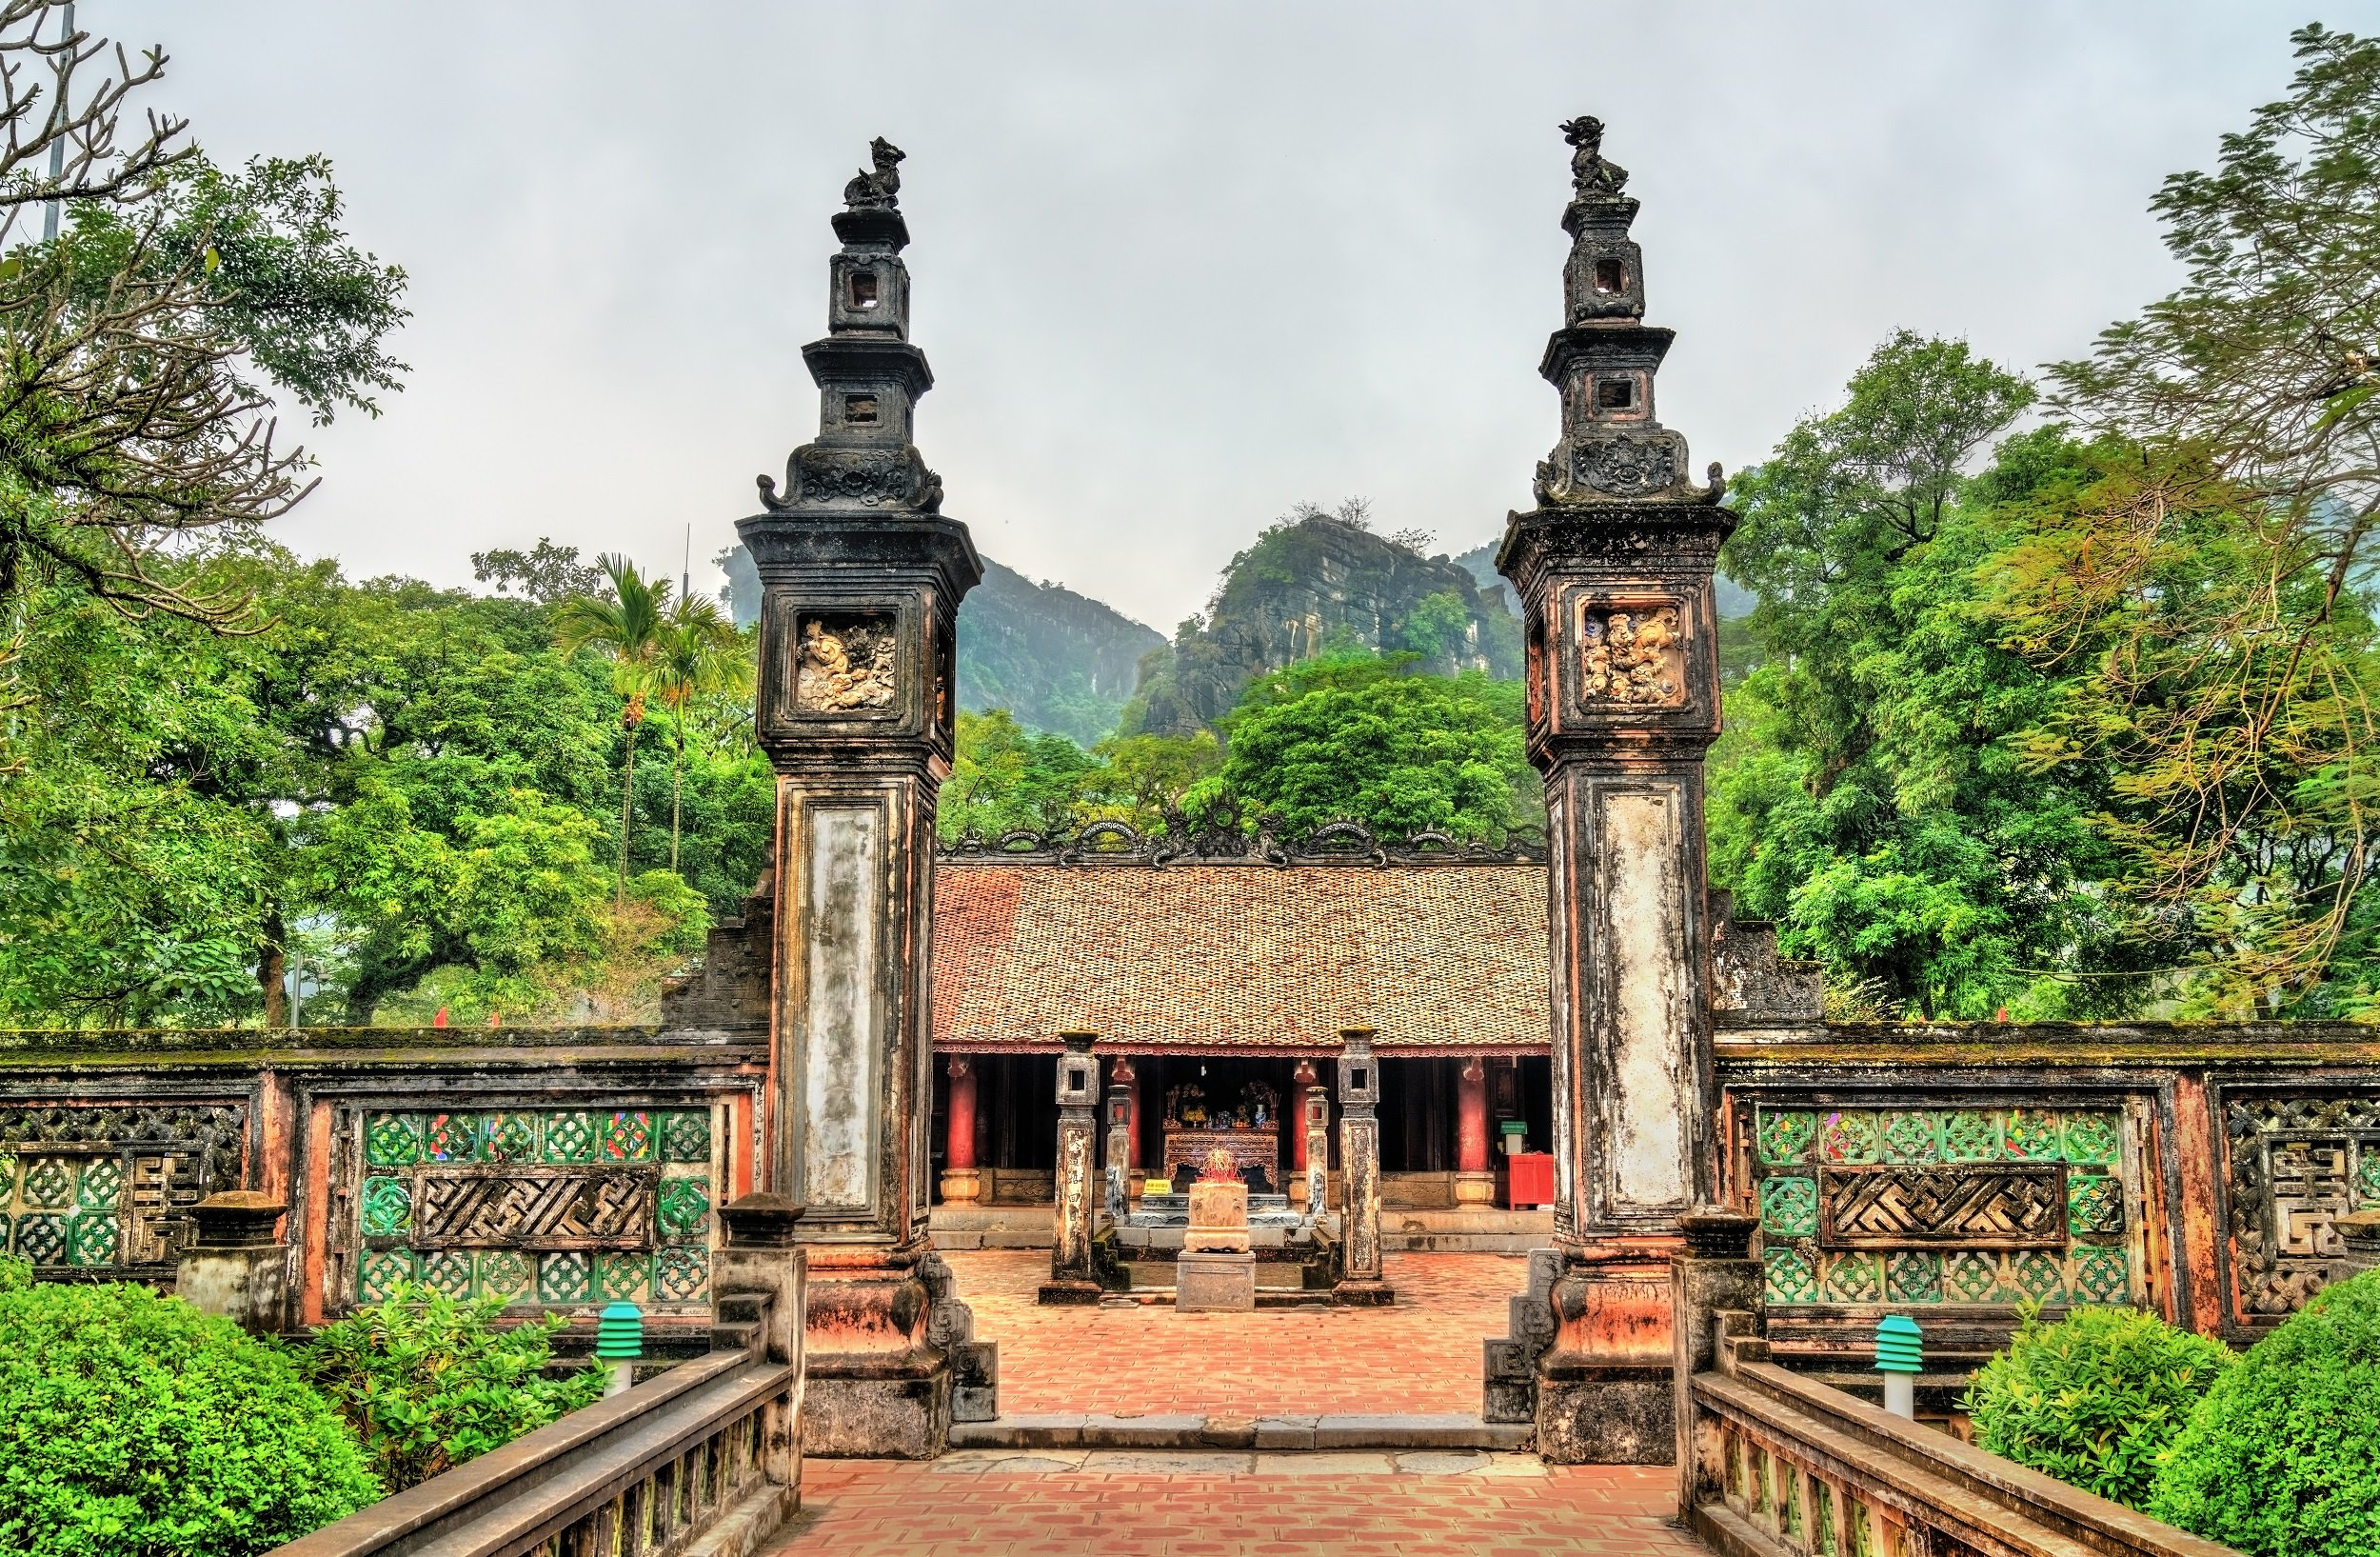 Marvel The Ancient City Of Hoa Lu On The Ninh Binh, Tam Coc, Dancing Cave & Hoa Lu Tour From Hanoi